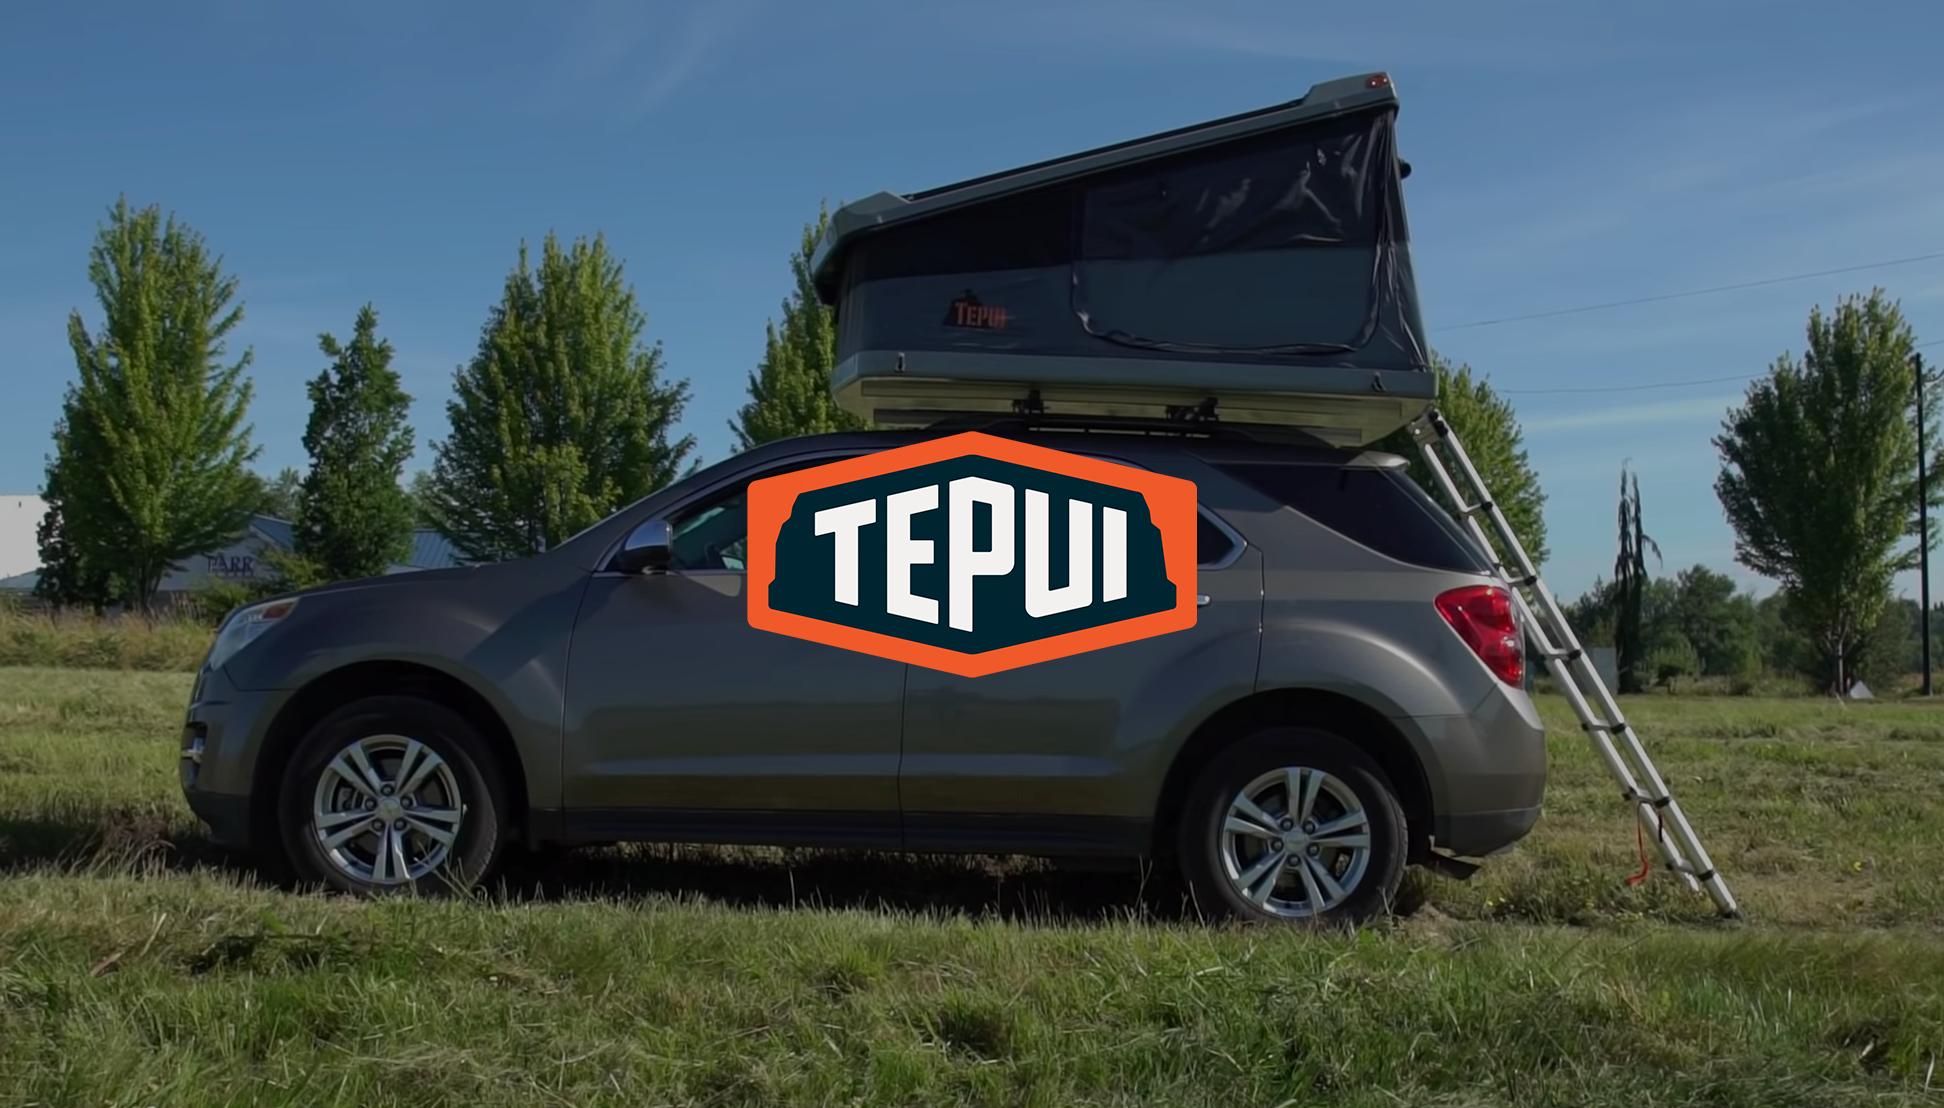 TEPUI_TENT_WEB_THUMB.png